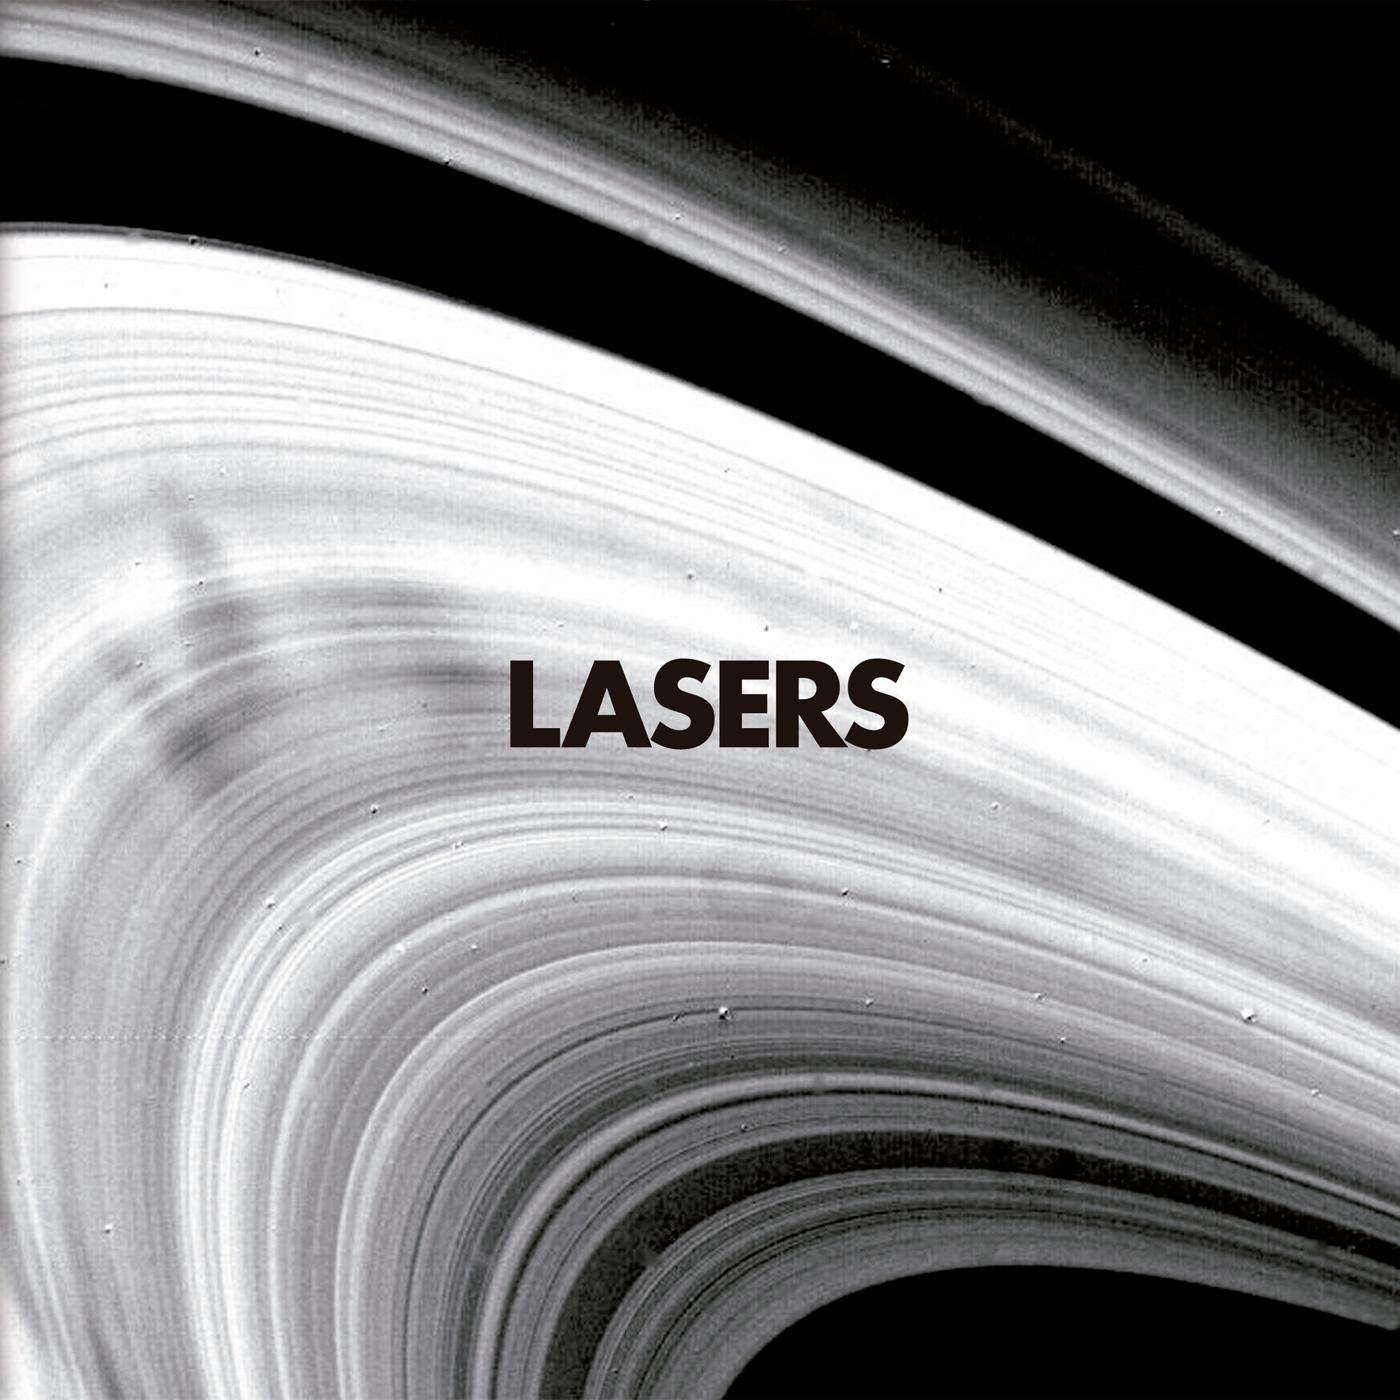 Lasers - Banda de música electrónica / grupo de música electrónica